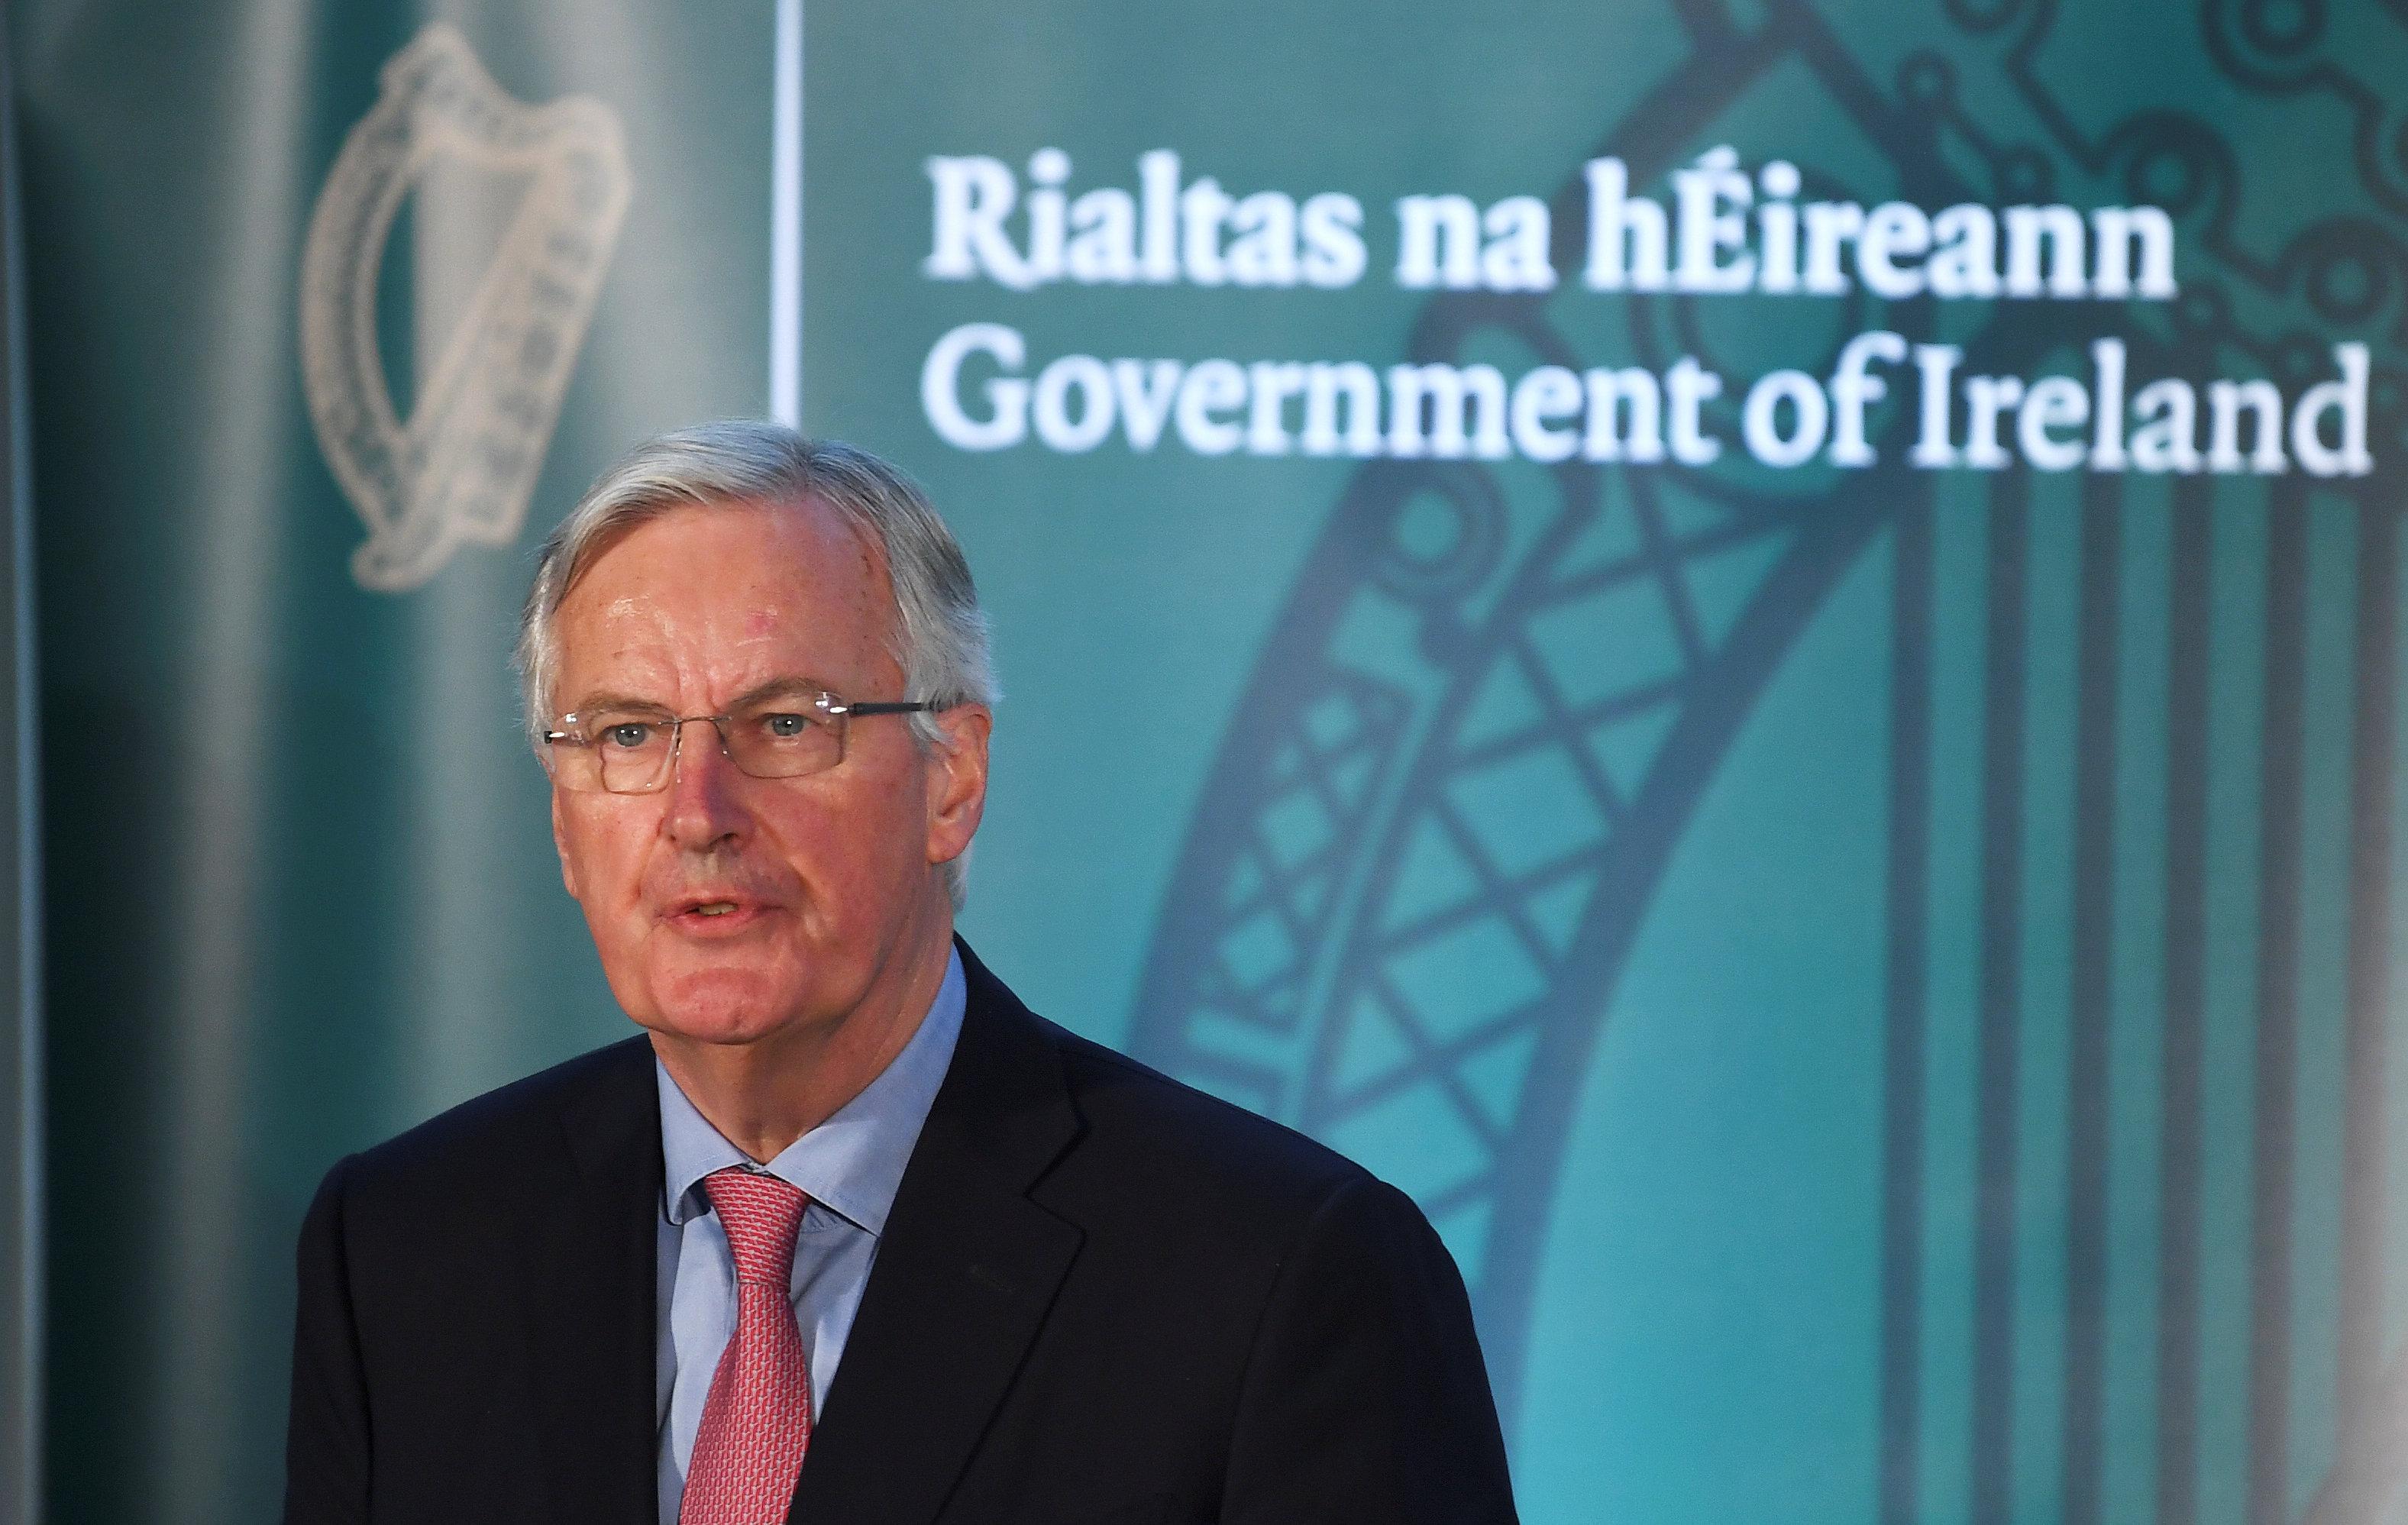 EU's Barnier says confident of deal to avoid hard Irish border